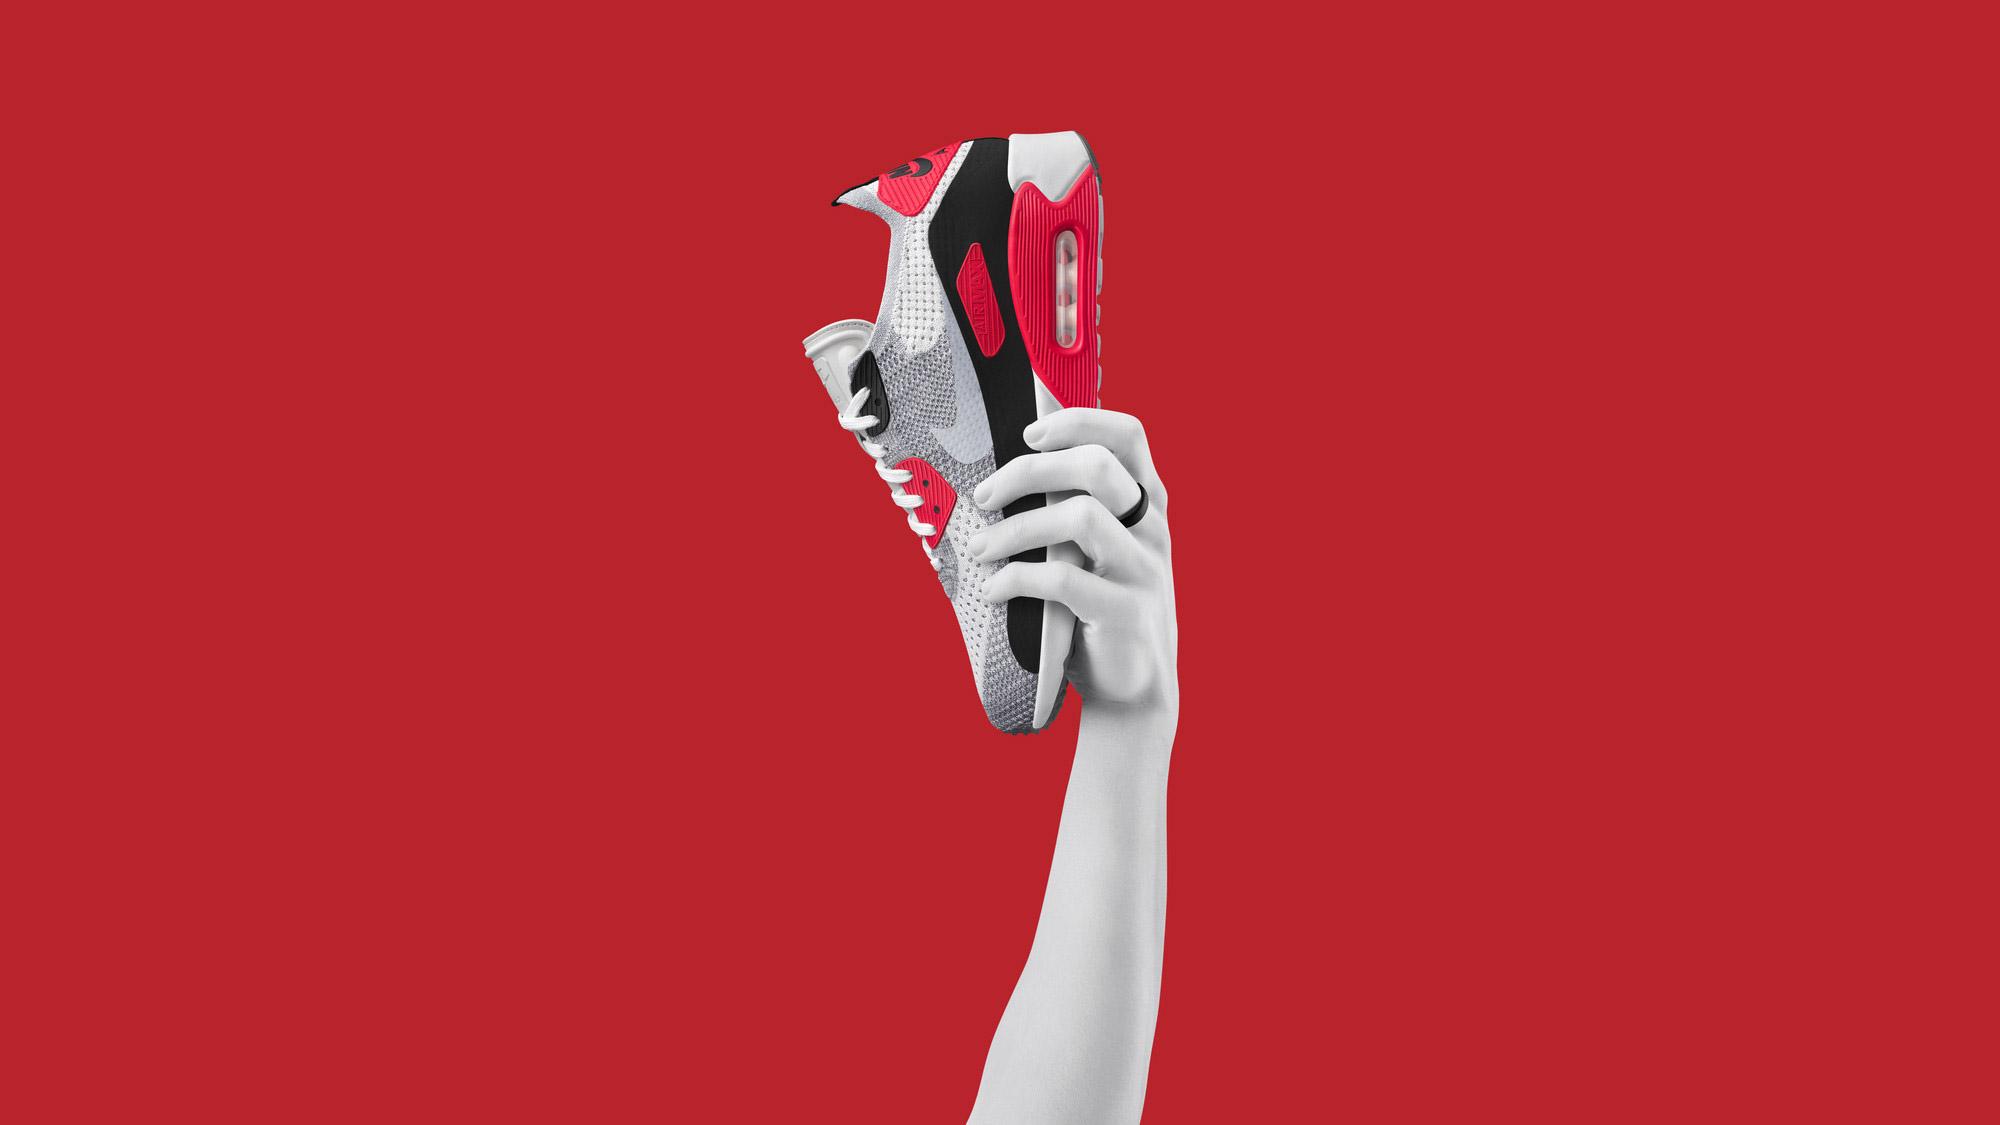 Nike Air Max Day 2017 7